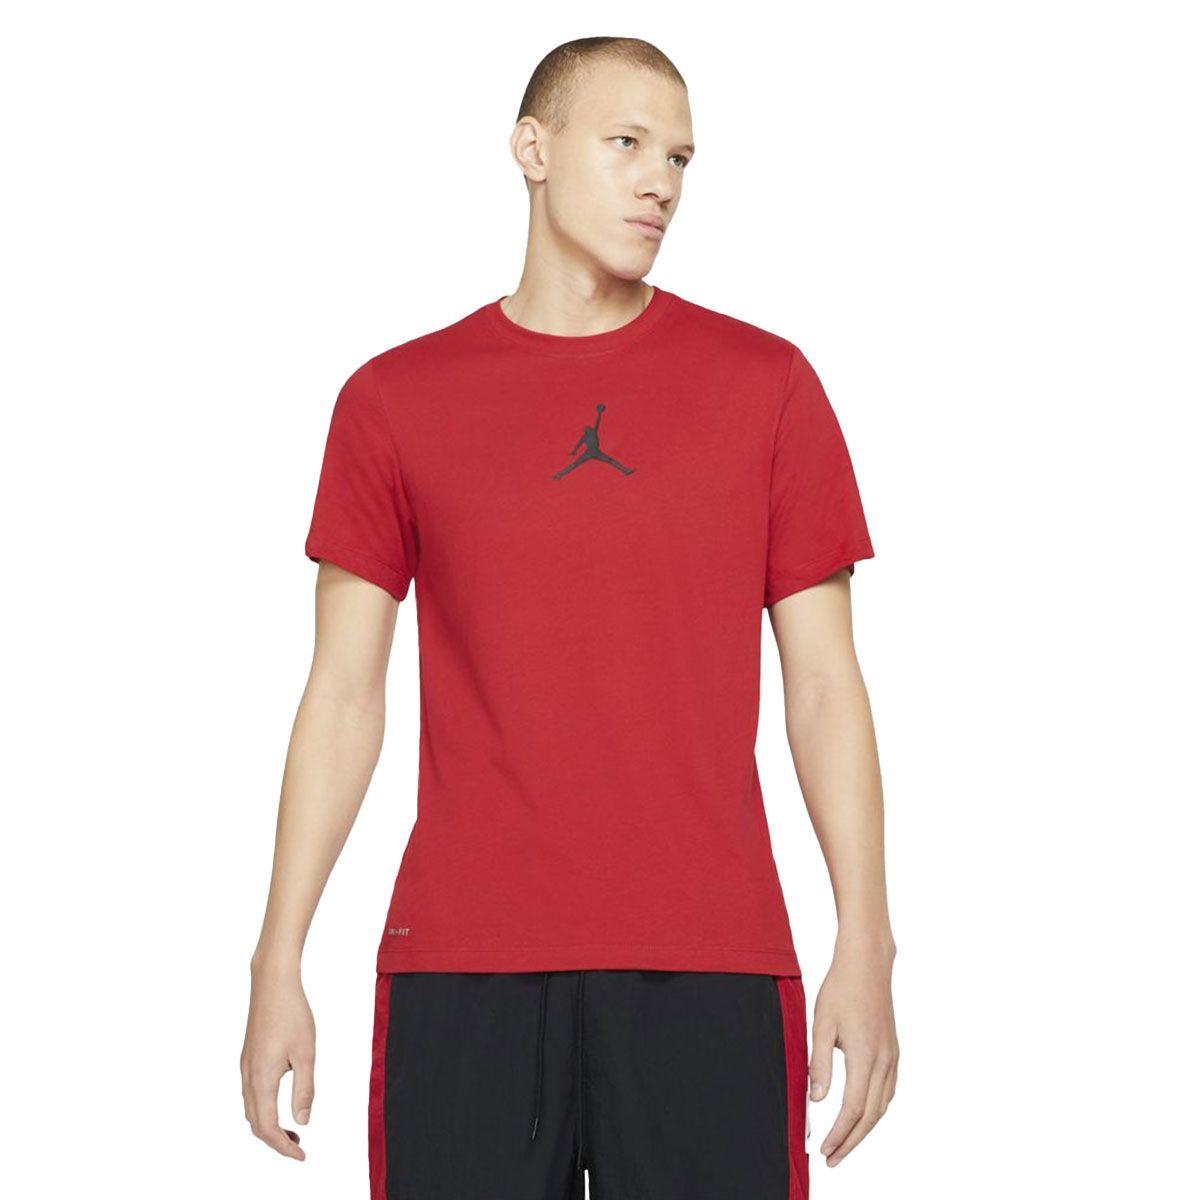 Nike T-Shirt Jordan Jumpman Uomo Rosso